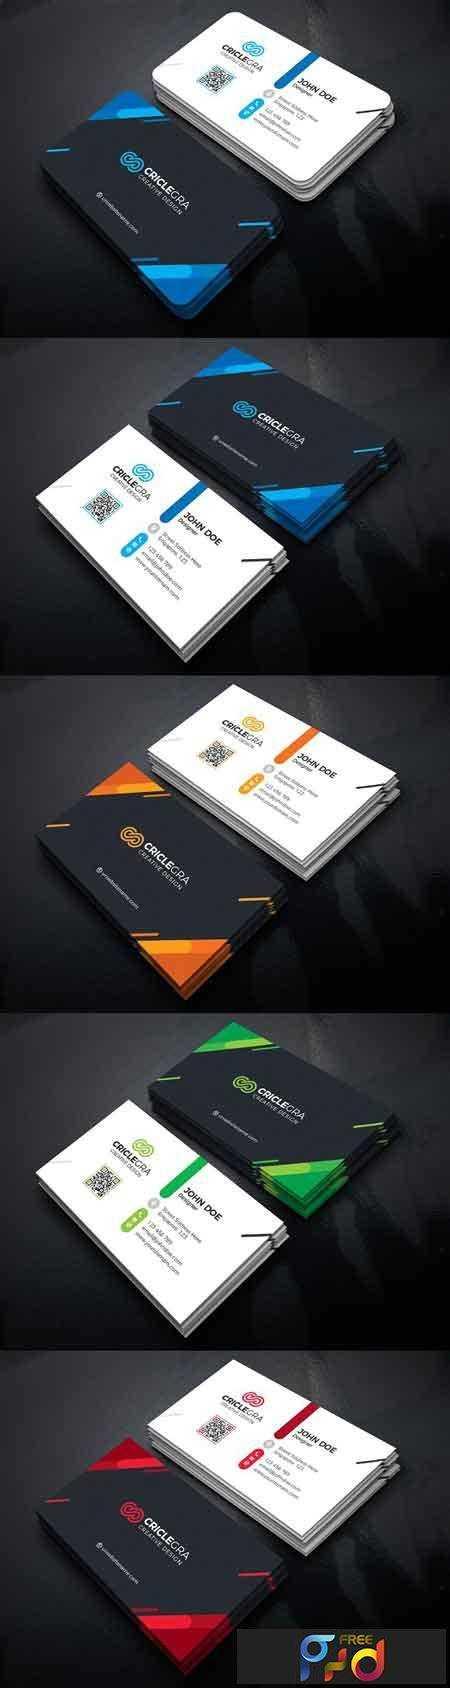 FreePsdVn.com_1705229_TEMPLATE_creative_business_card_1827632